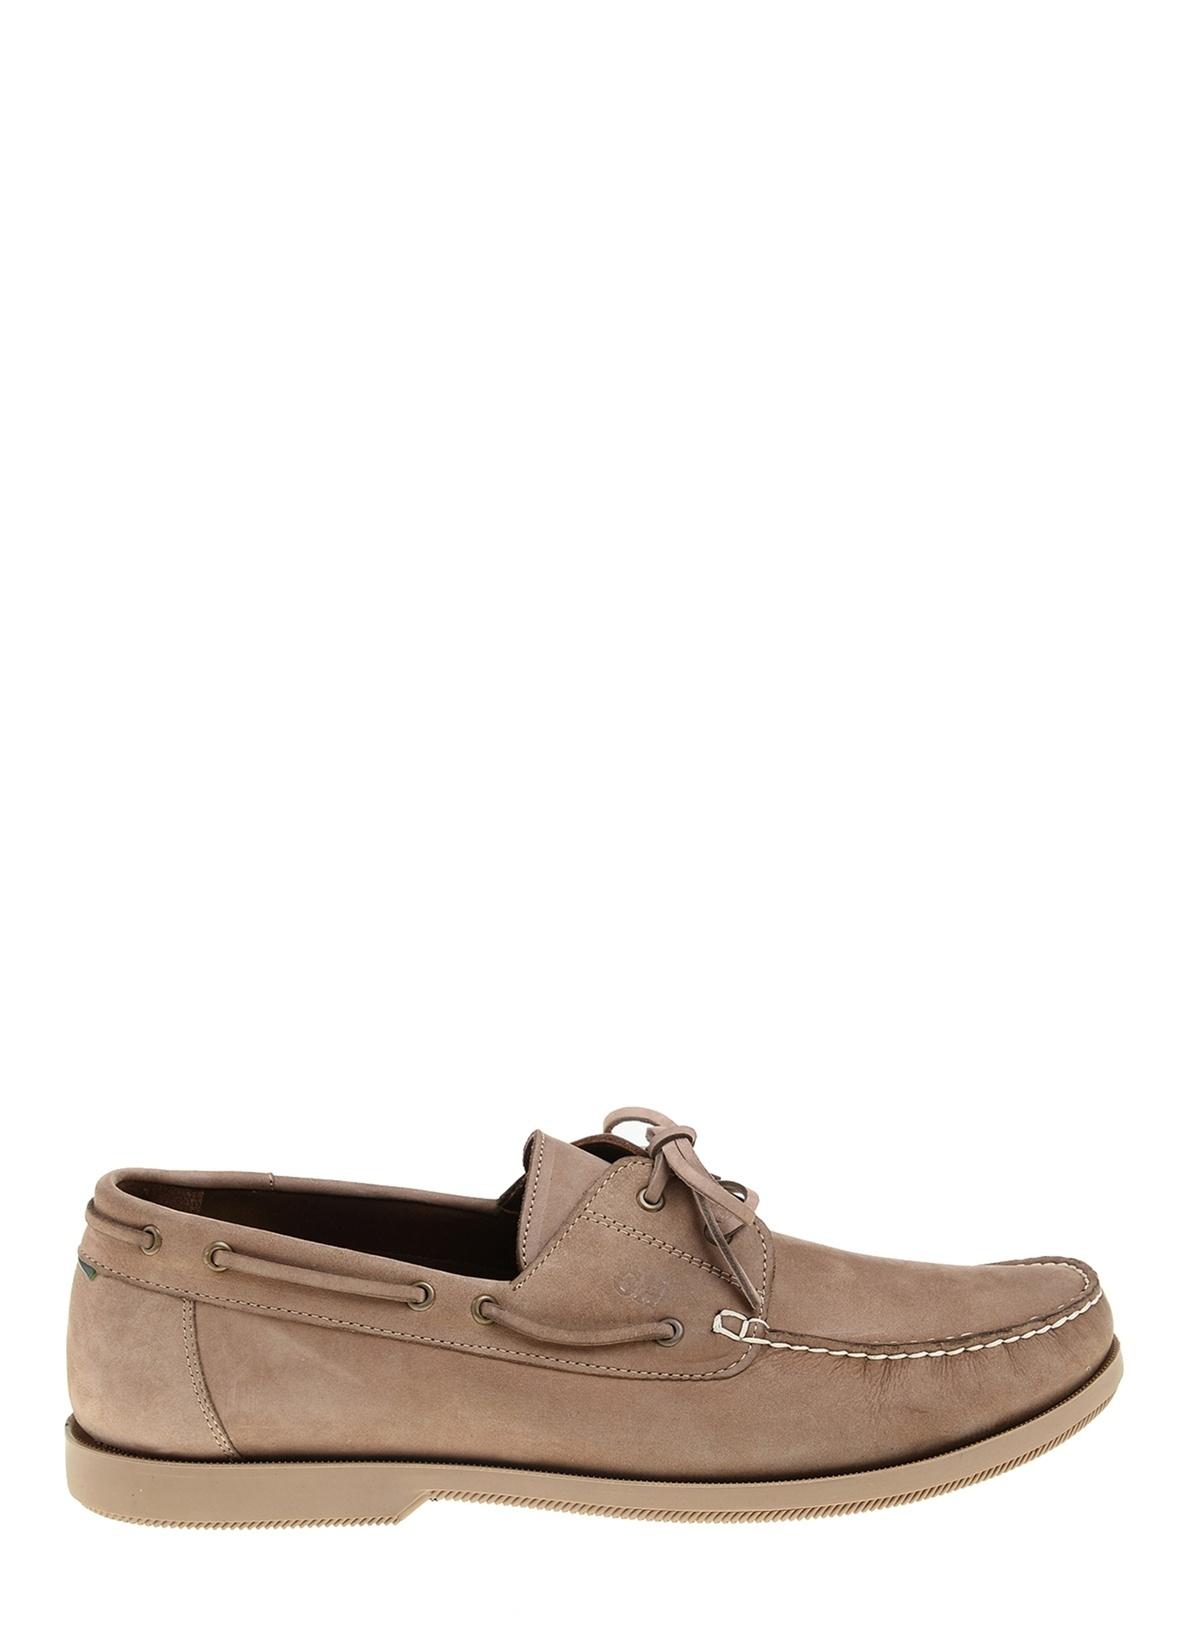 George Hogg Ayakkabı 7002935 E Loafer – 597.0 TL